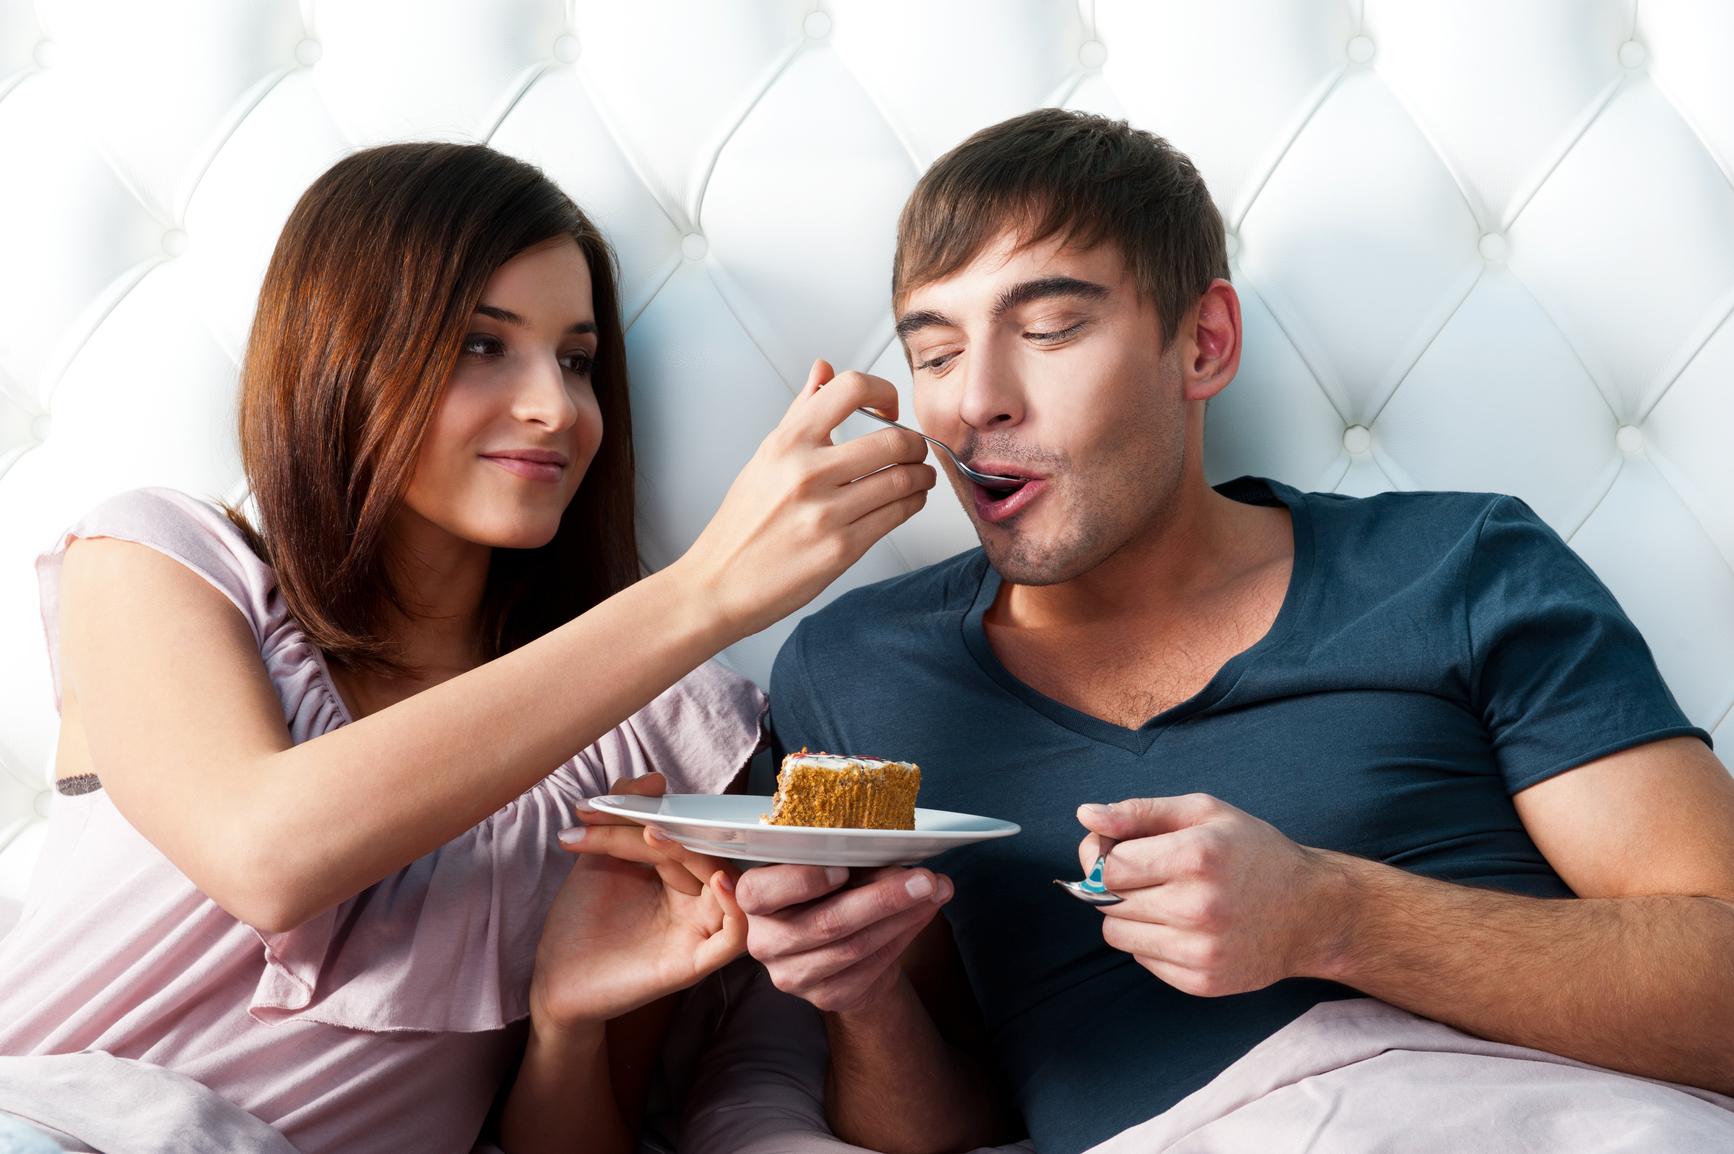 Меню для мужчины секс и еда